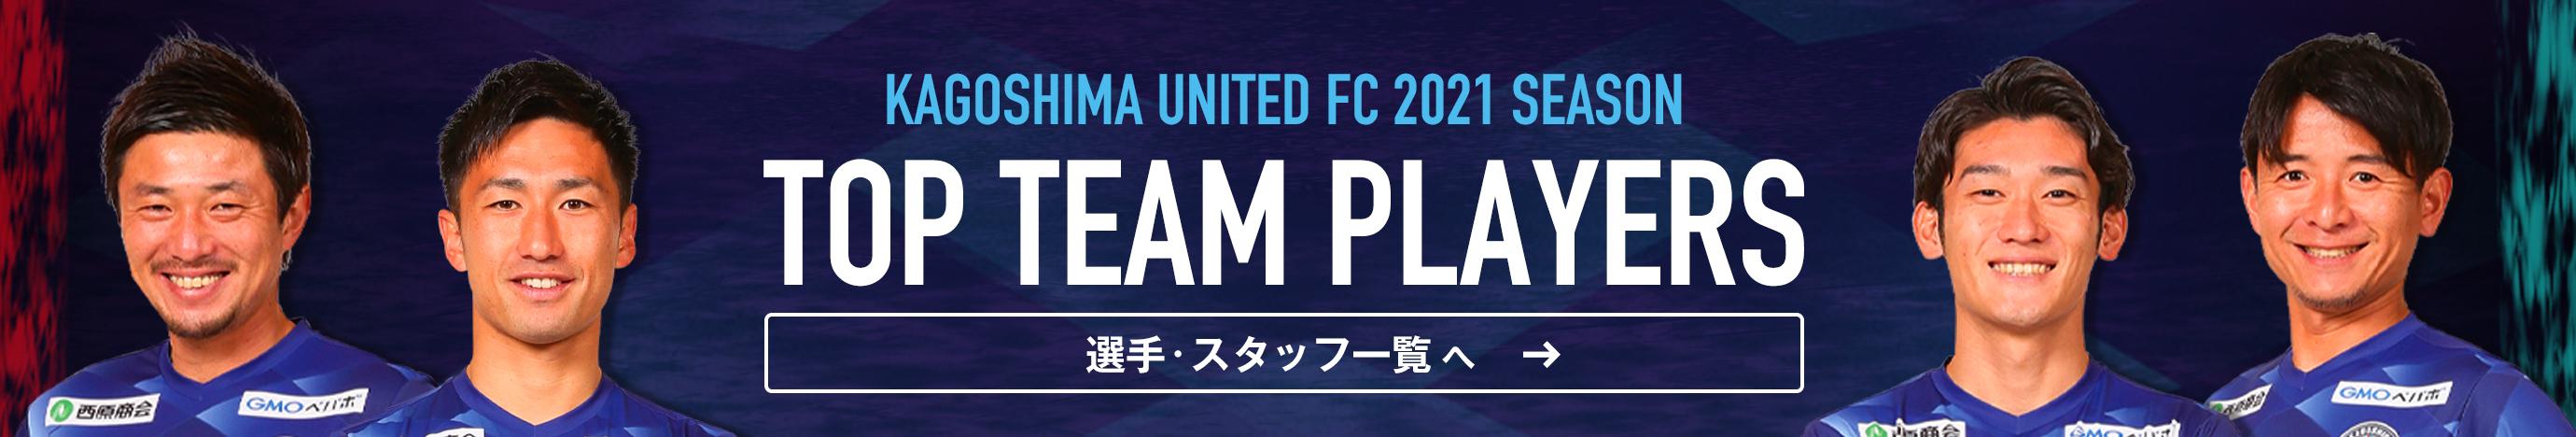 KAGOSHIMA UNITED FC 2021 SEASON TOP TEAM PLAYERS